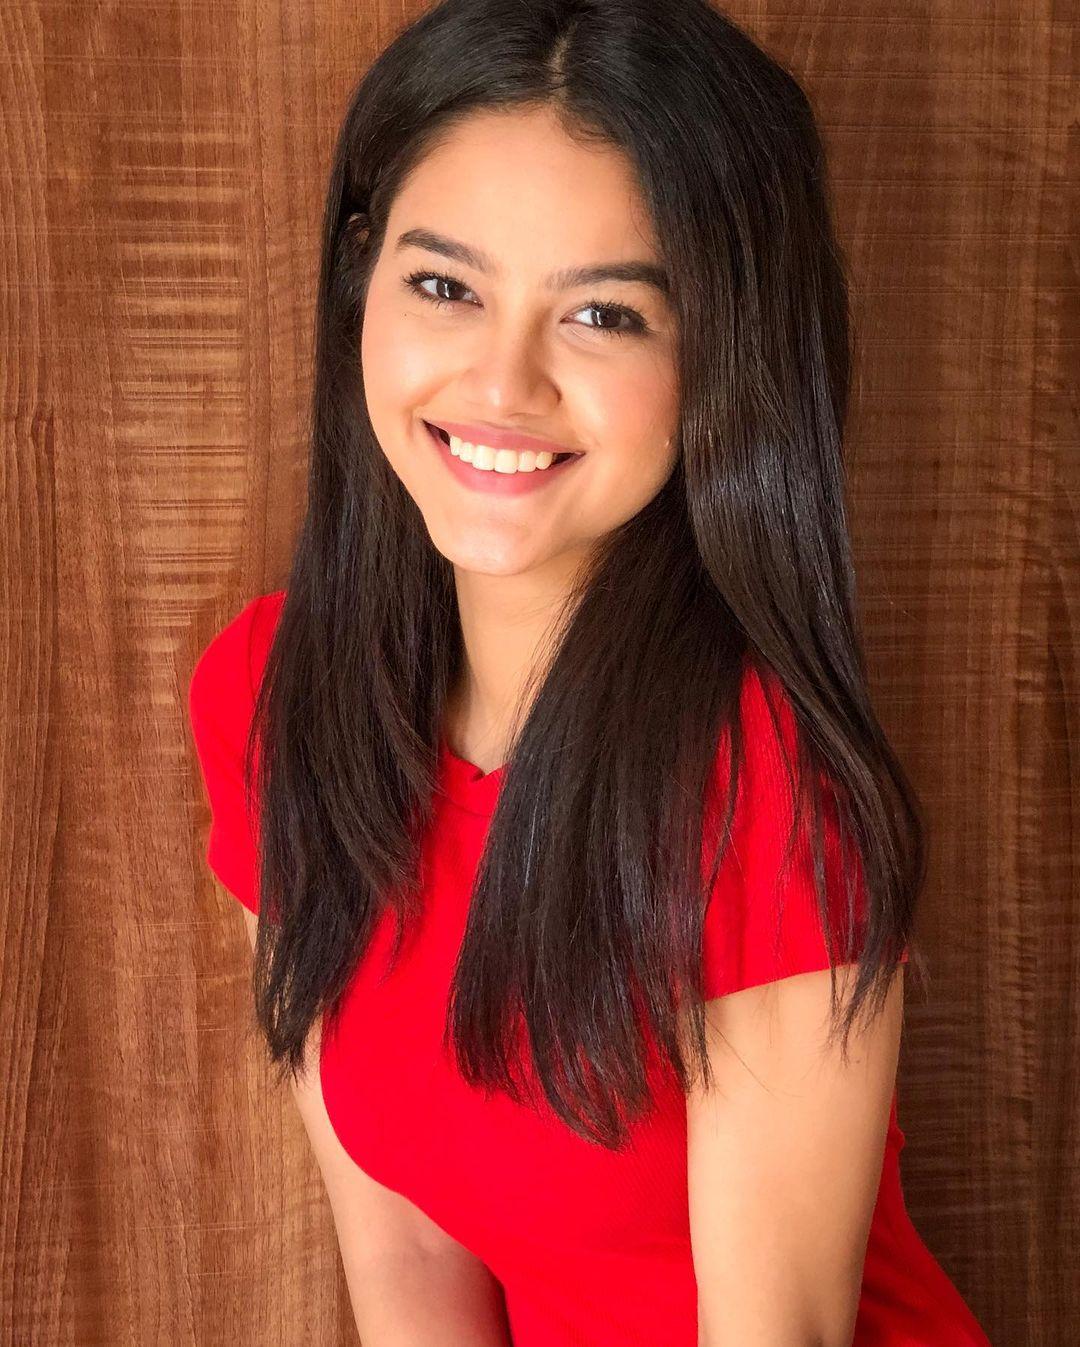 Priyal Mahajan Biography, Instagram, Parents, Early Life, and Facebook